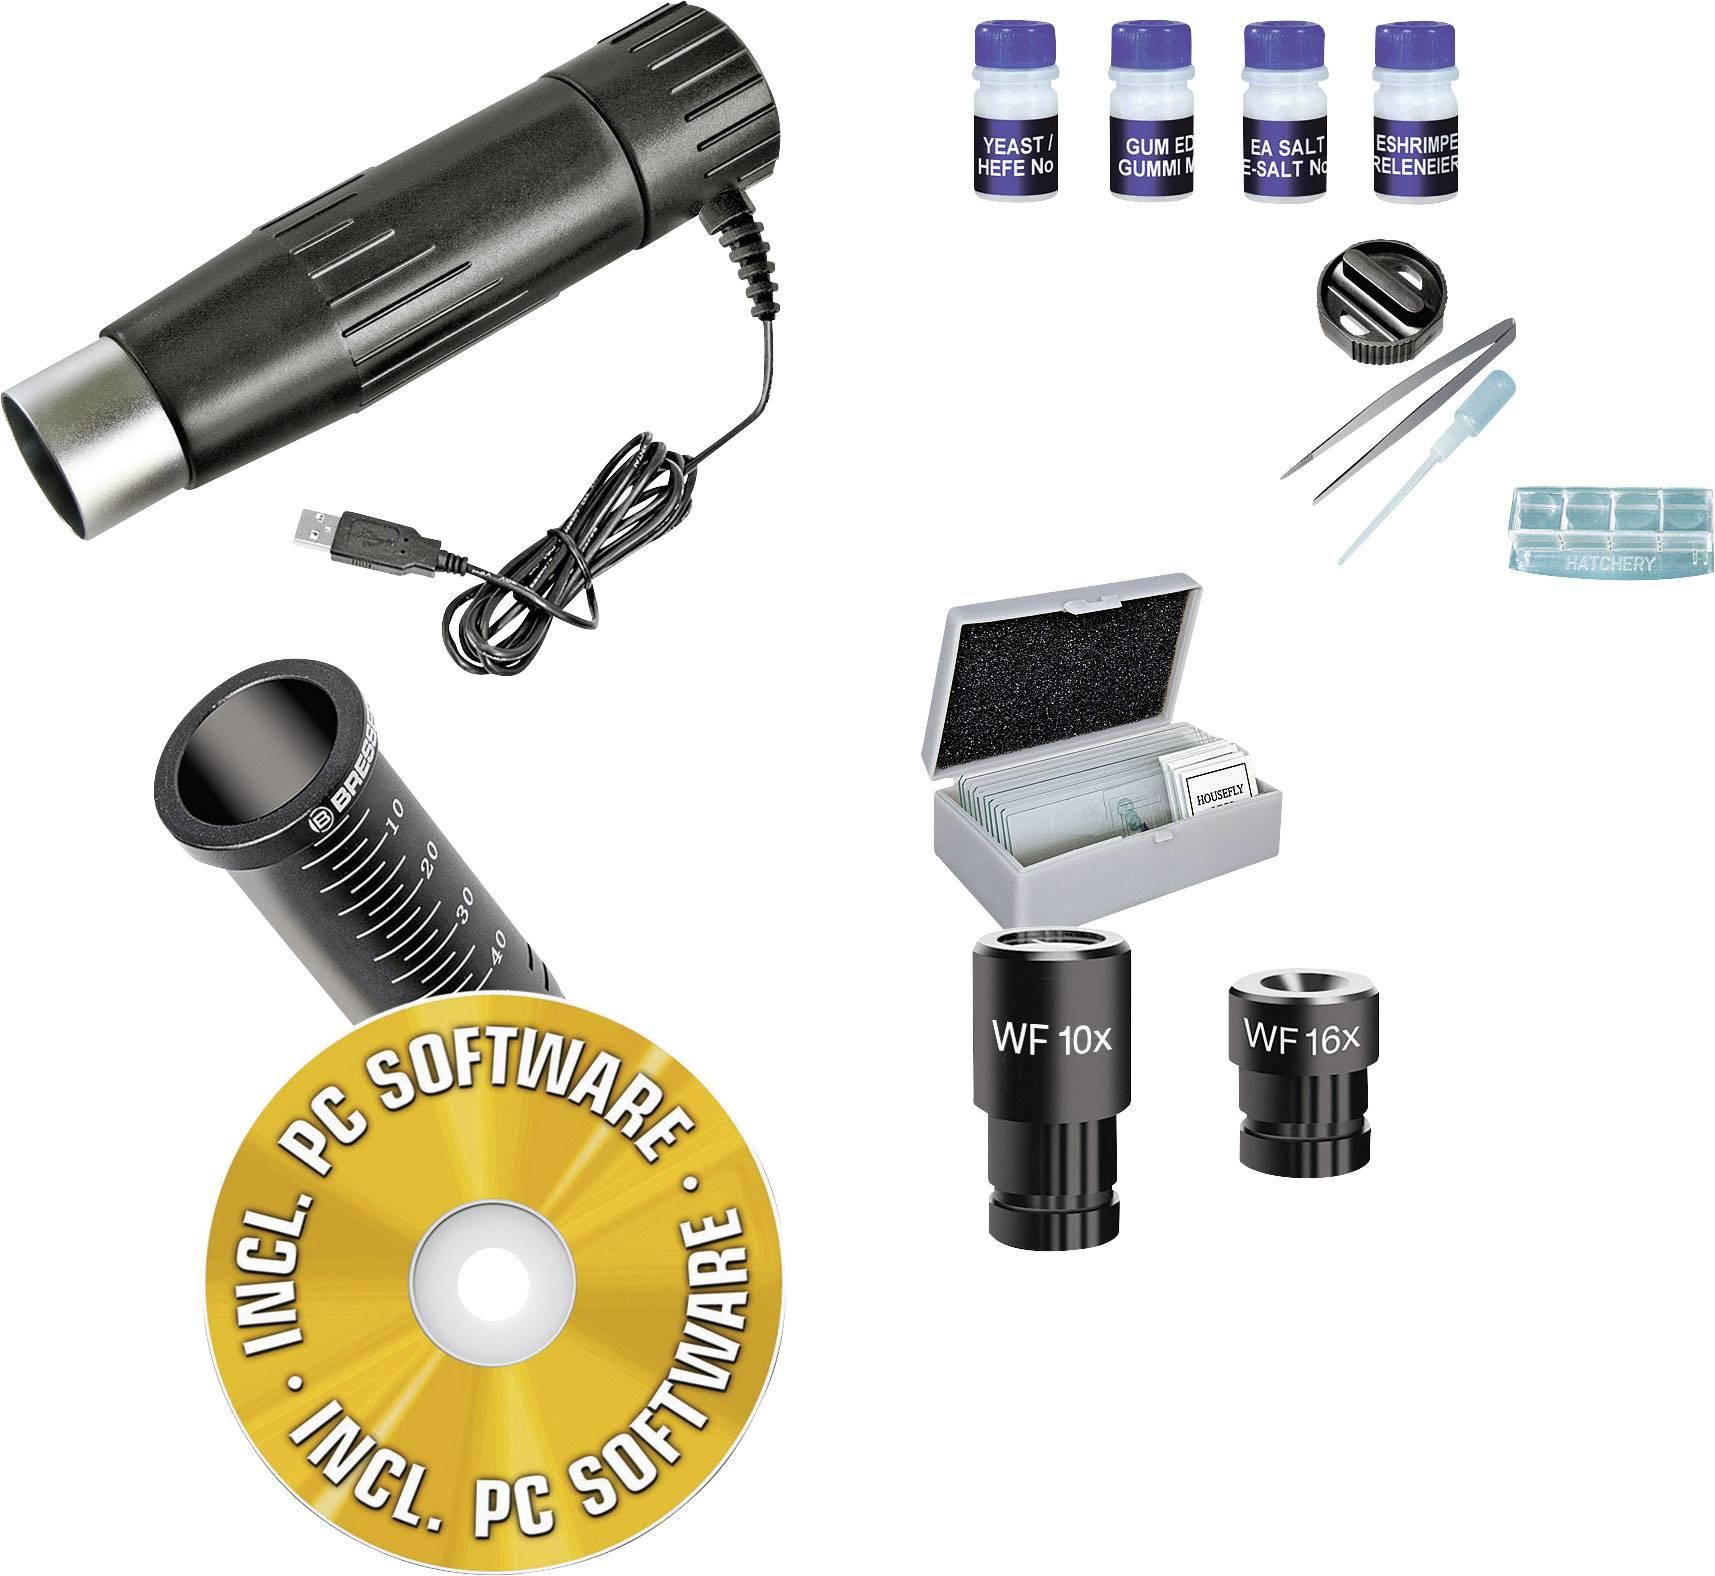 Mikroskop Bresser Junior 40x - 1024x, USB výstup